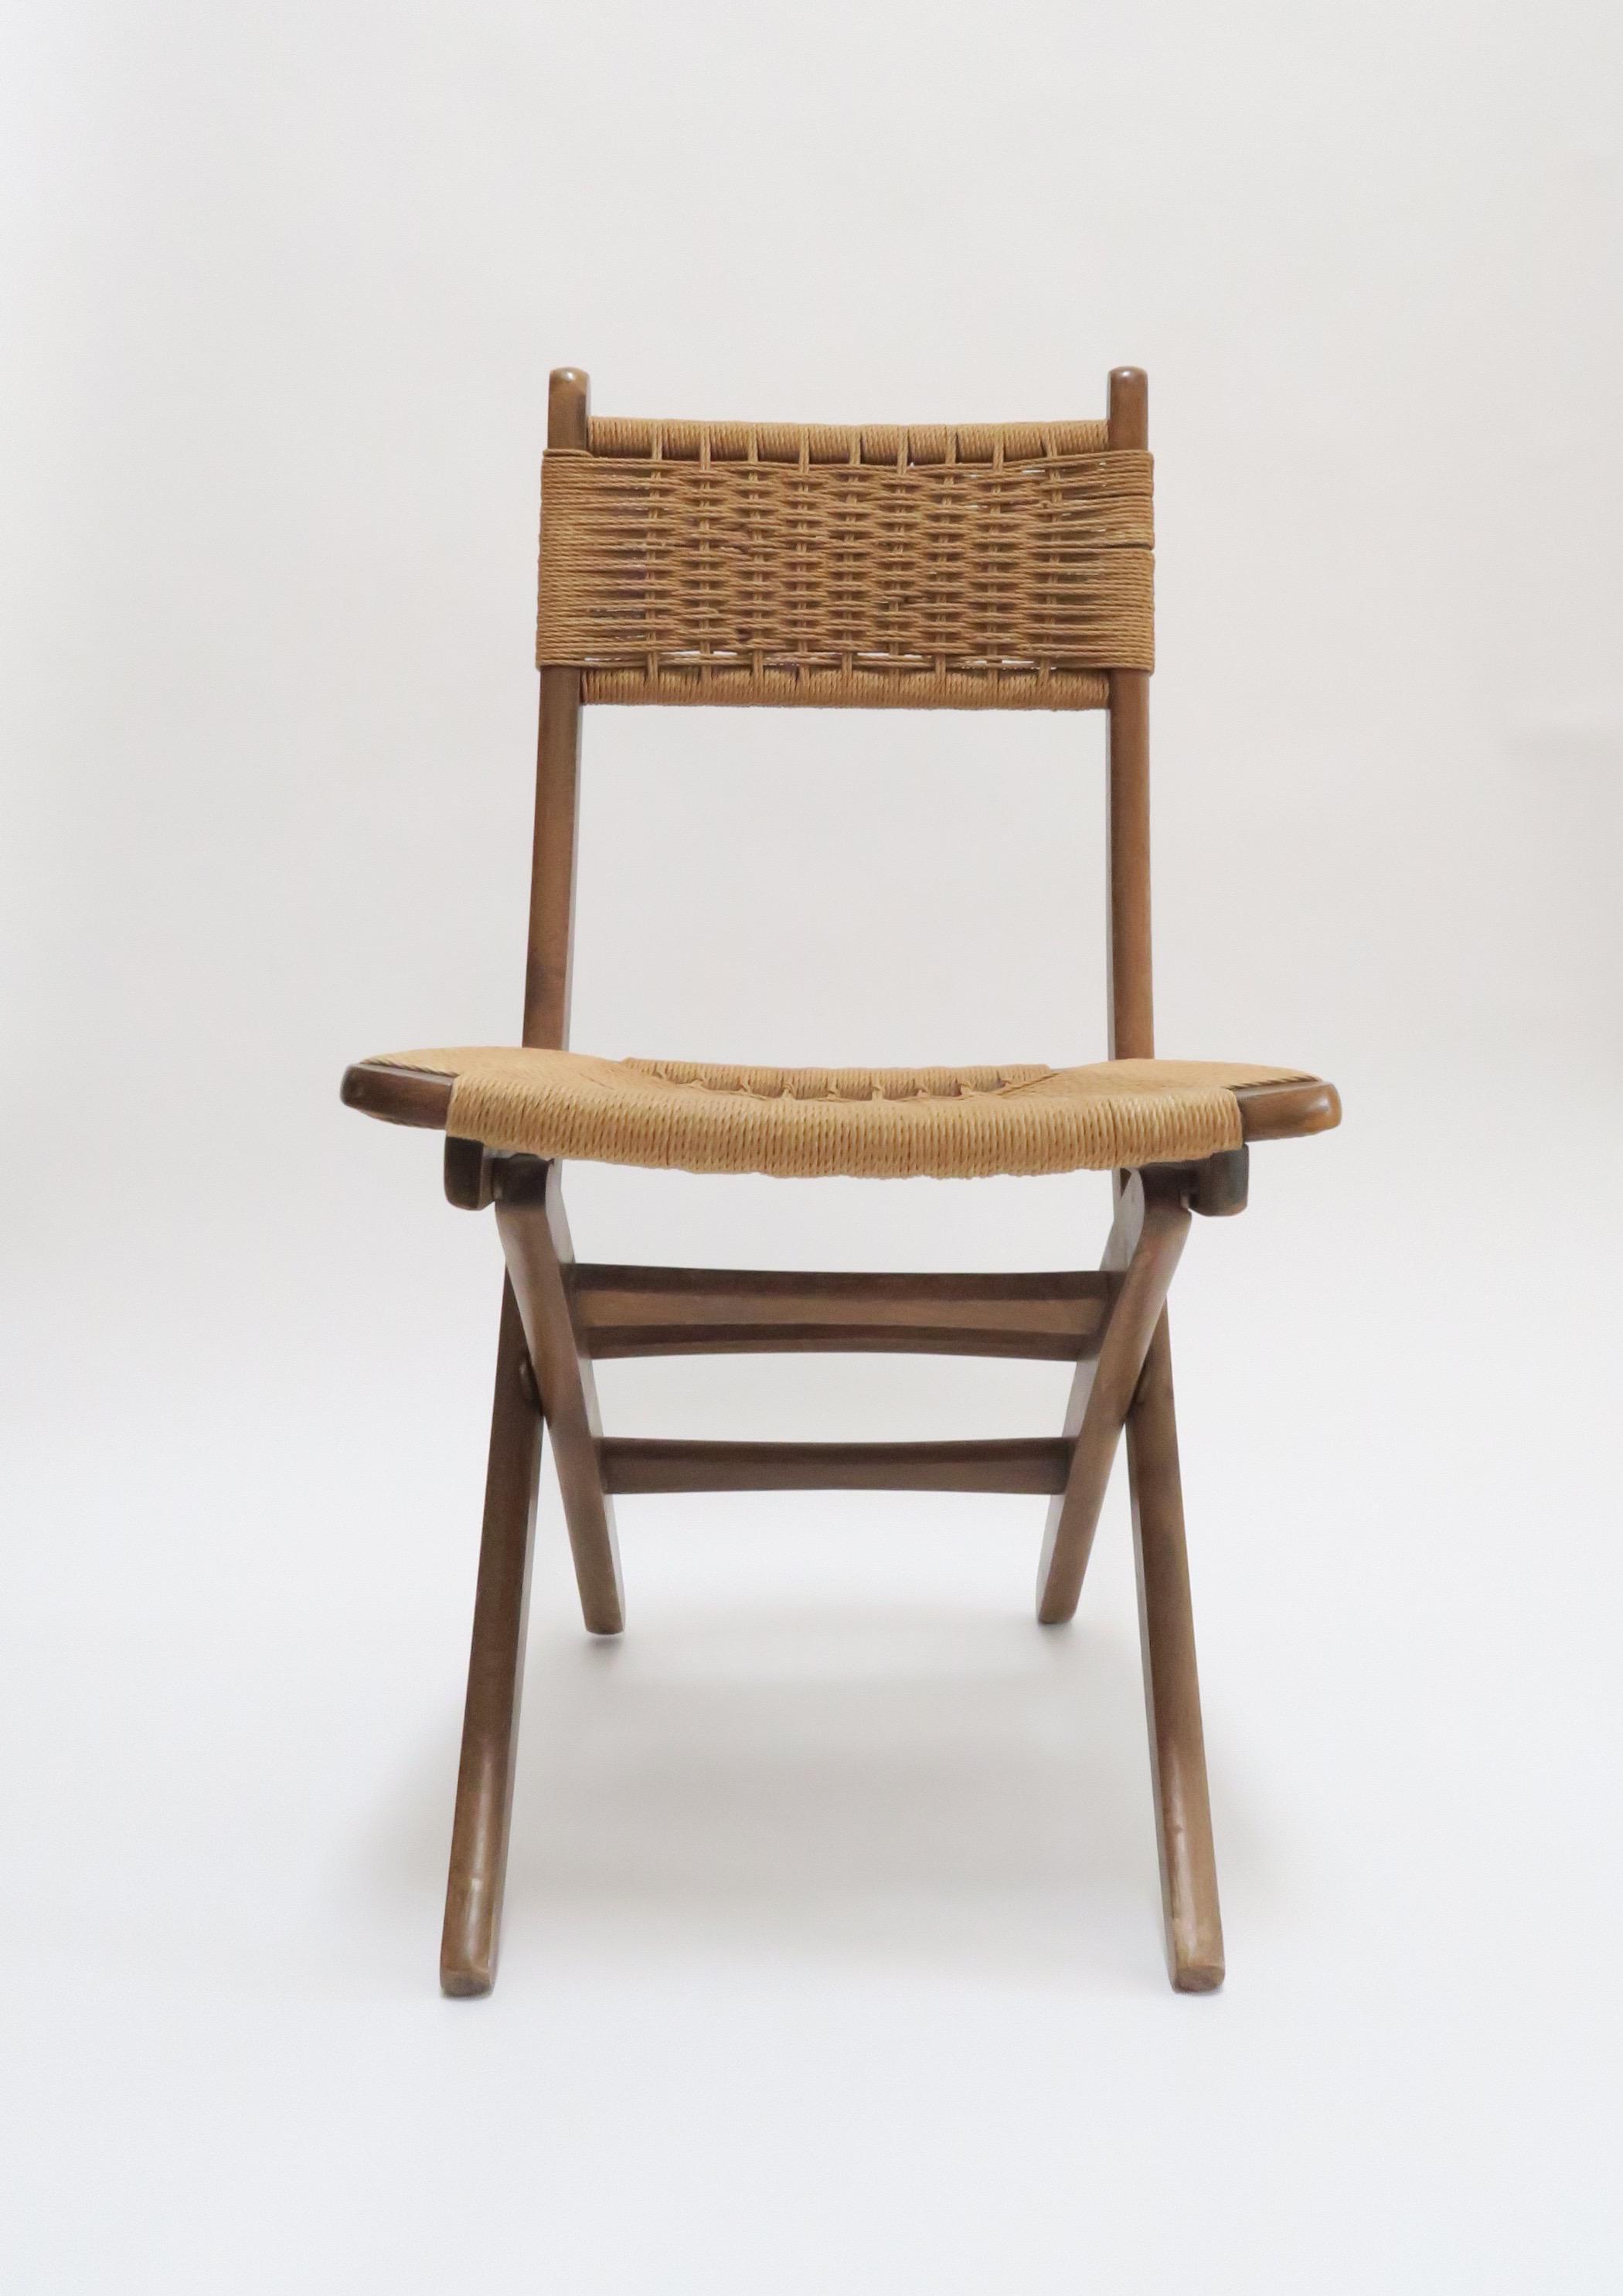 Modern Folding Chair #41 - Vintage Danish Modern Rope Folding Chair - Image 3 Of 7